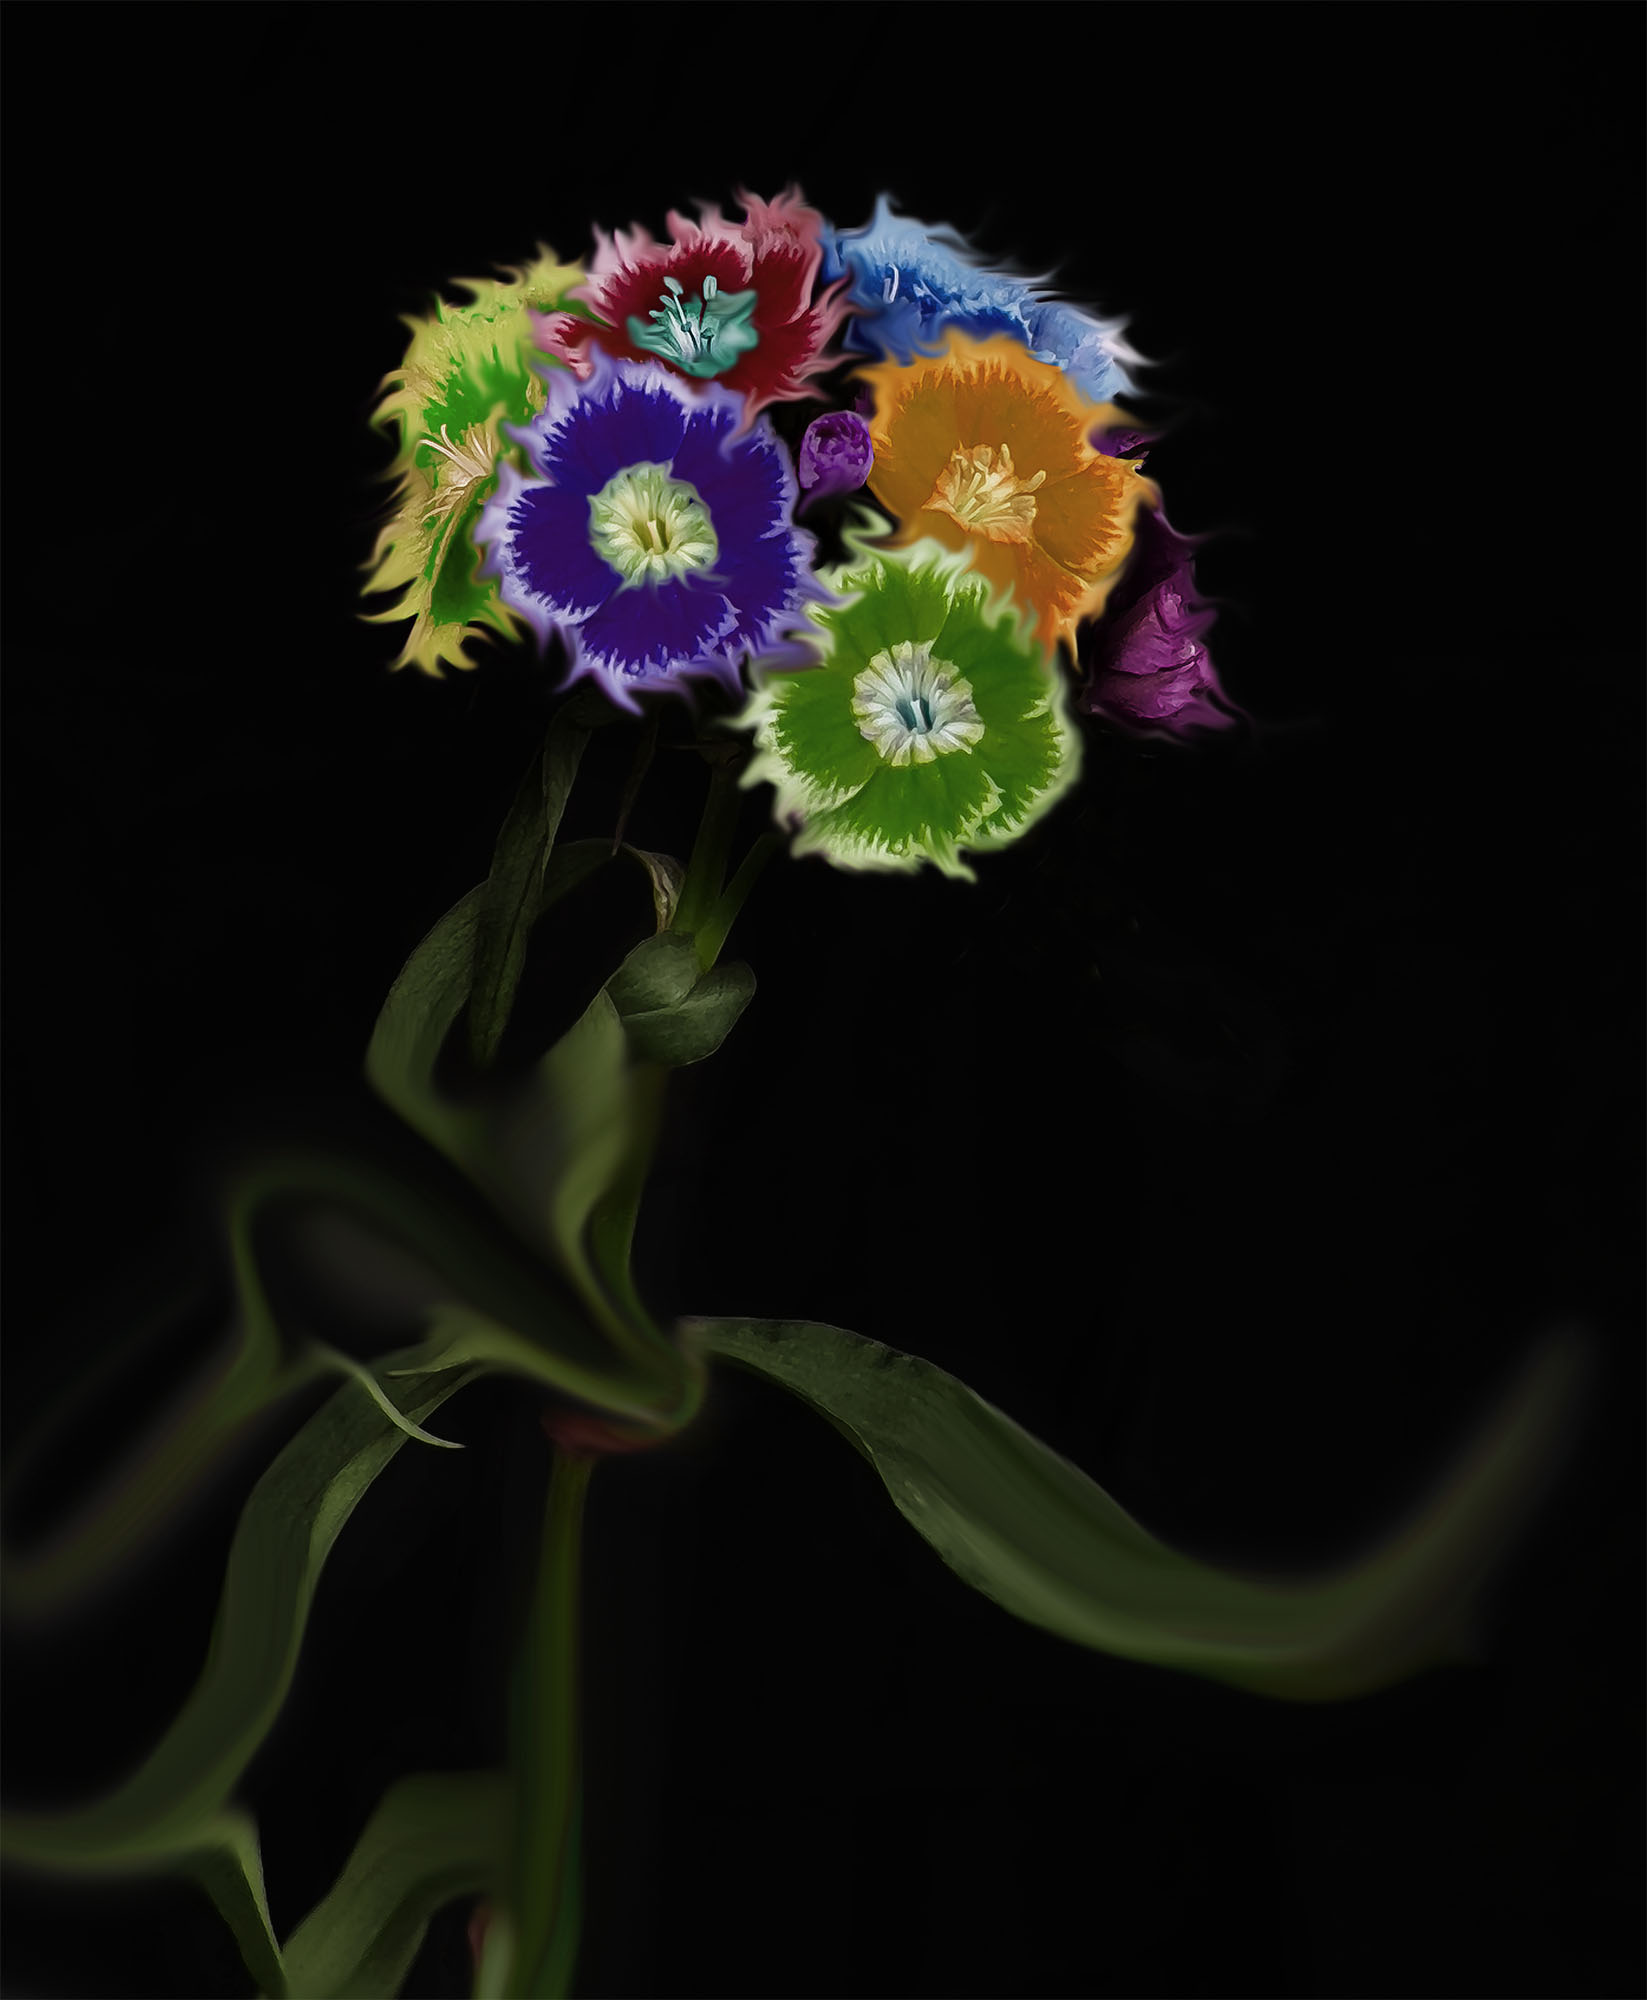 © Ilar Gunilla Persson | Power Flower